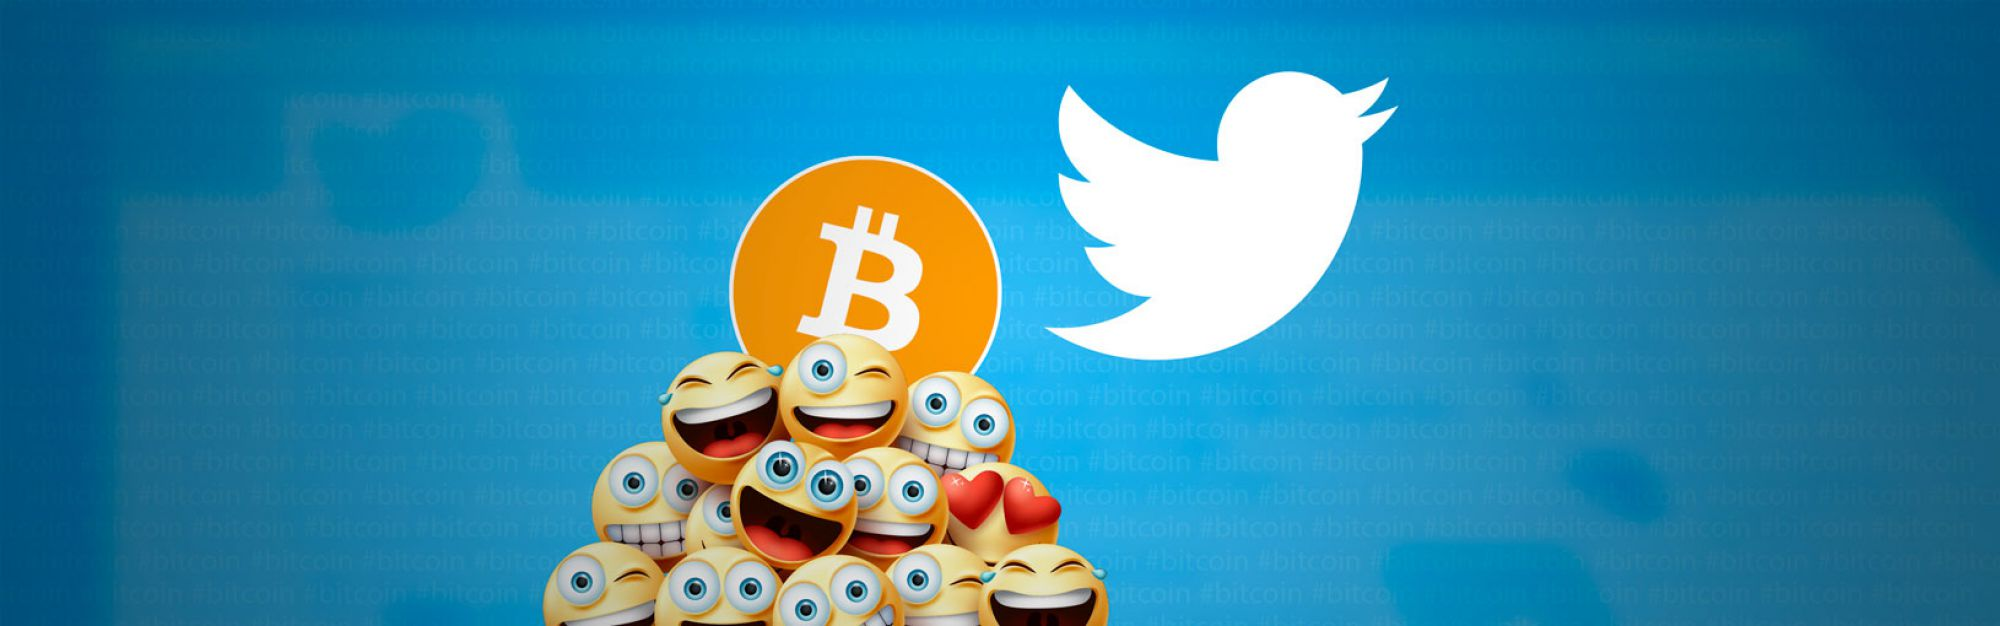 Twitter surprised Bitcoin